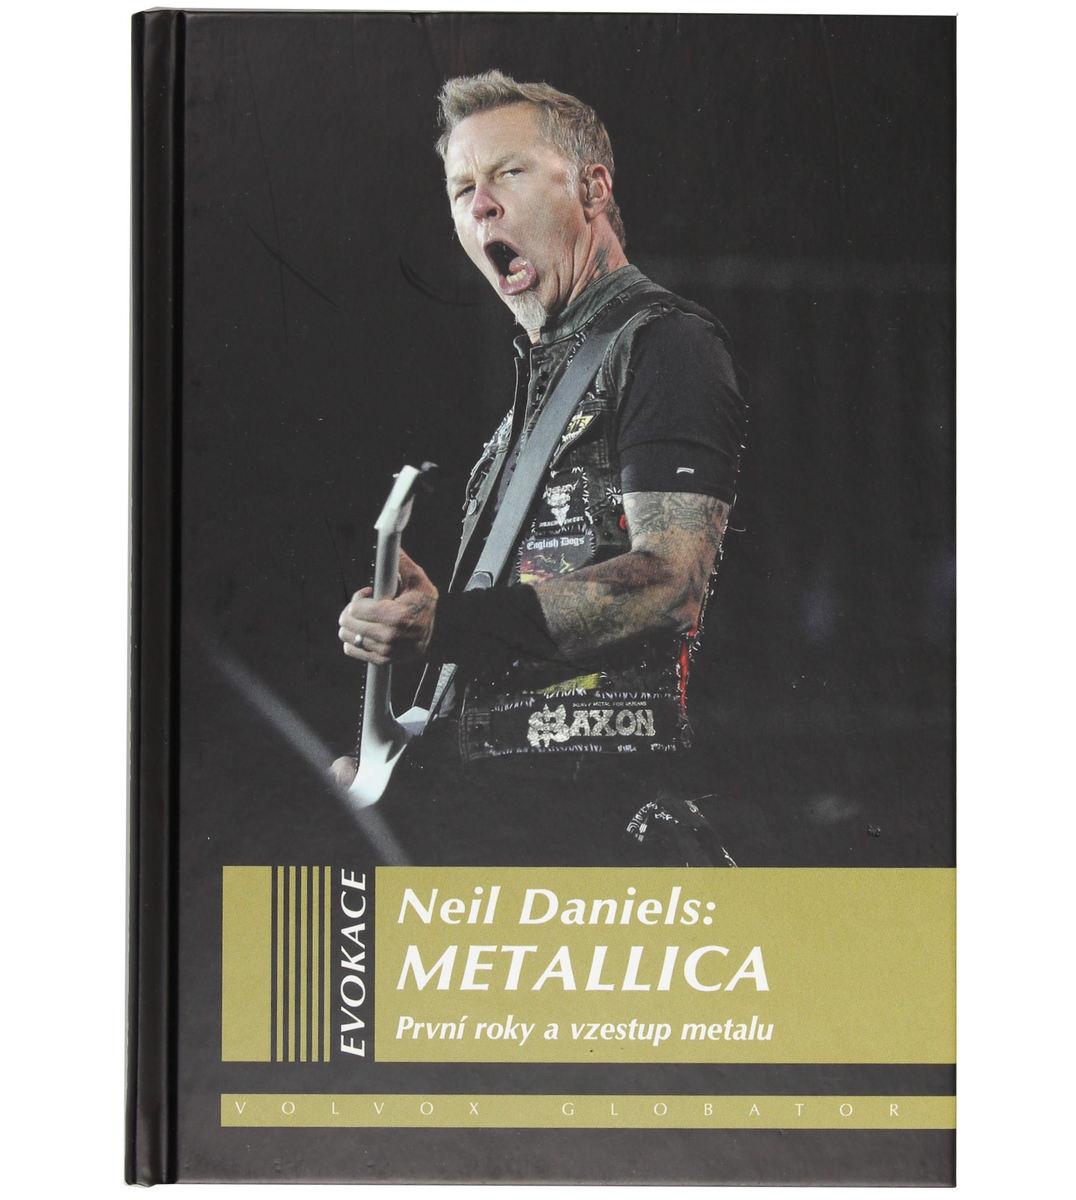 kniha Metallica - První roky a vzestup metalu - Neil Daniels